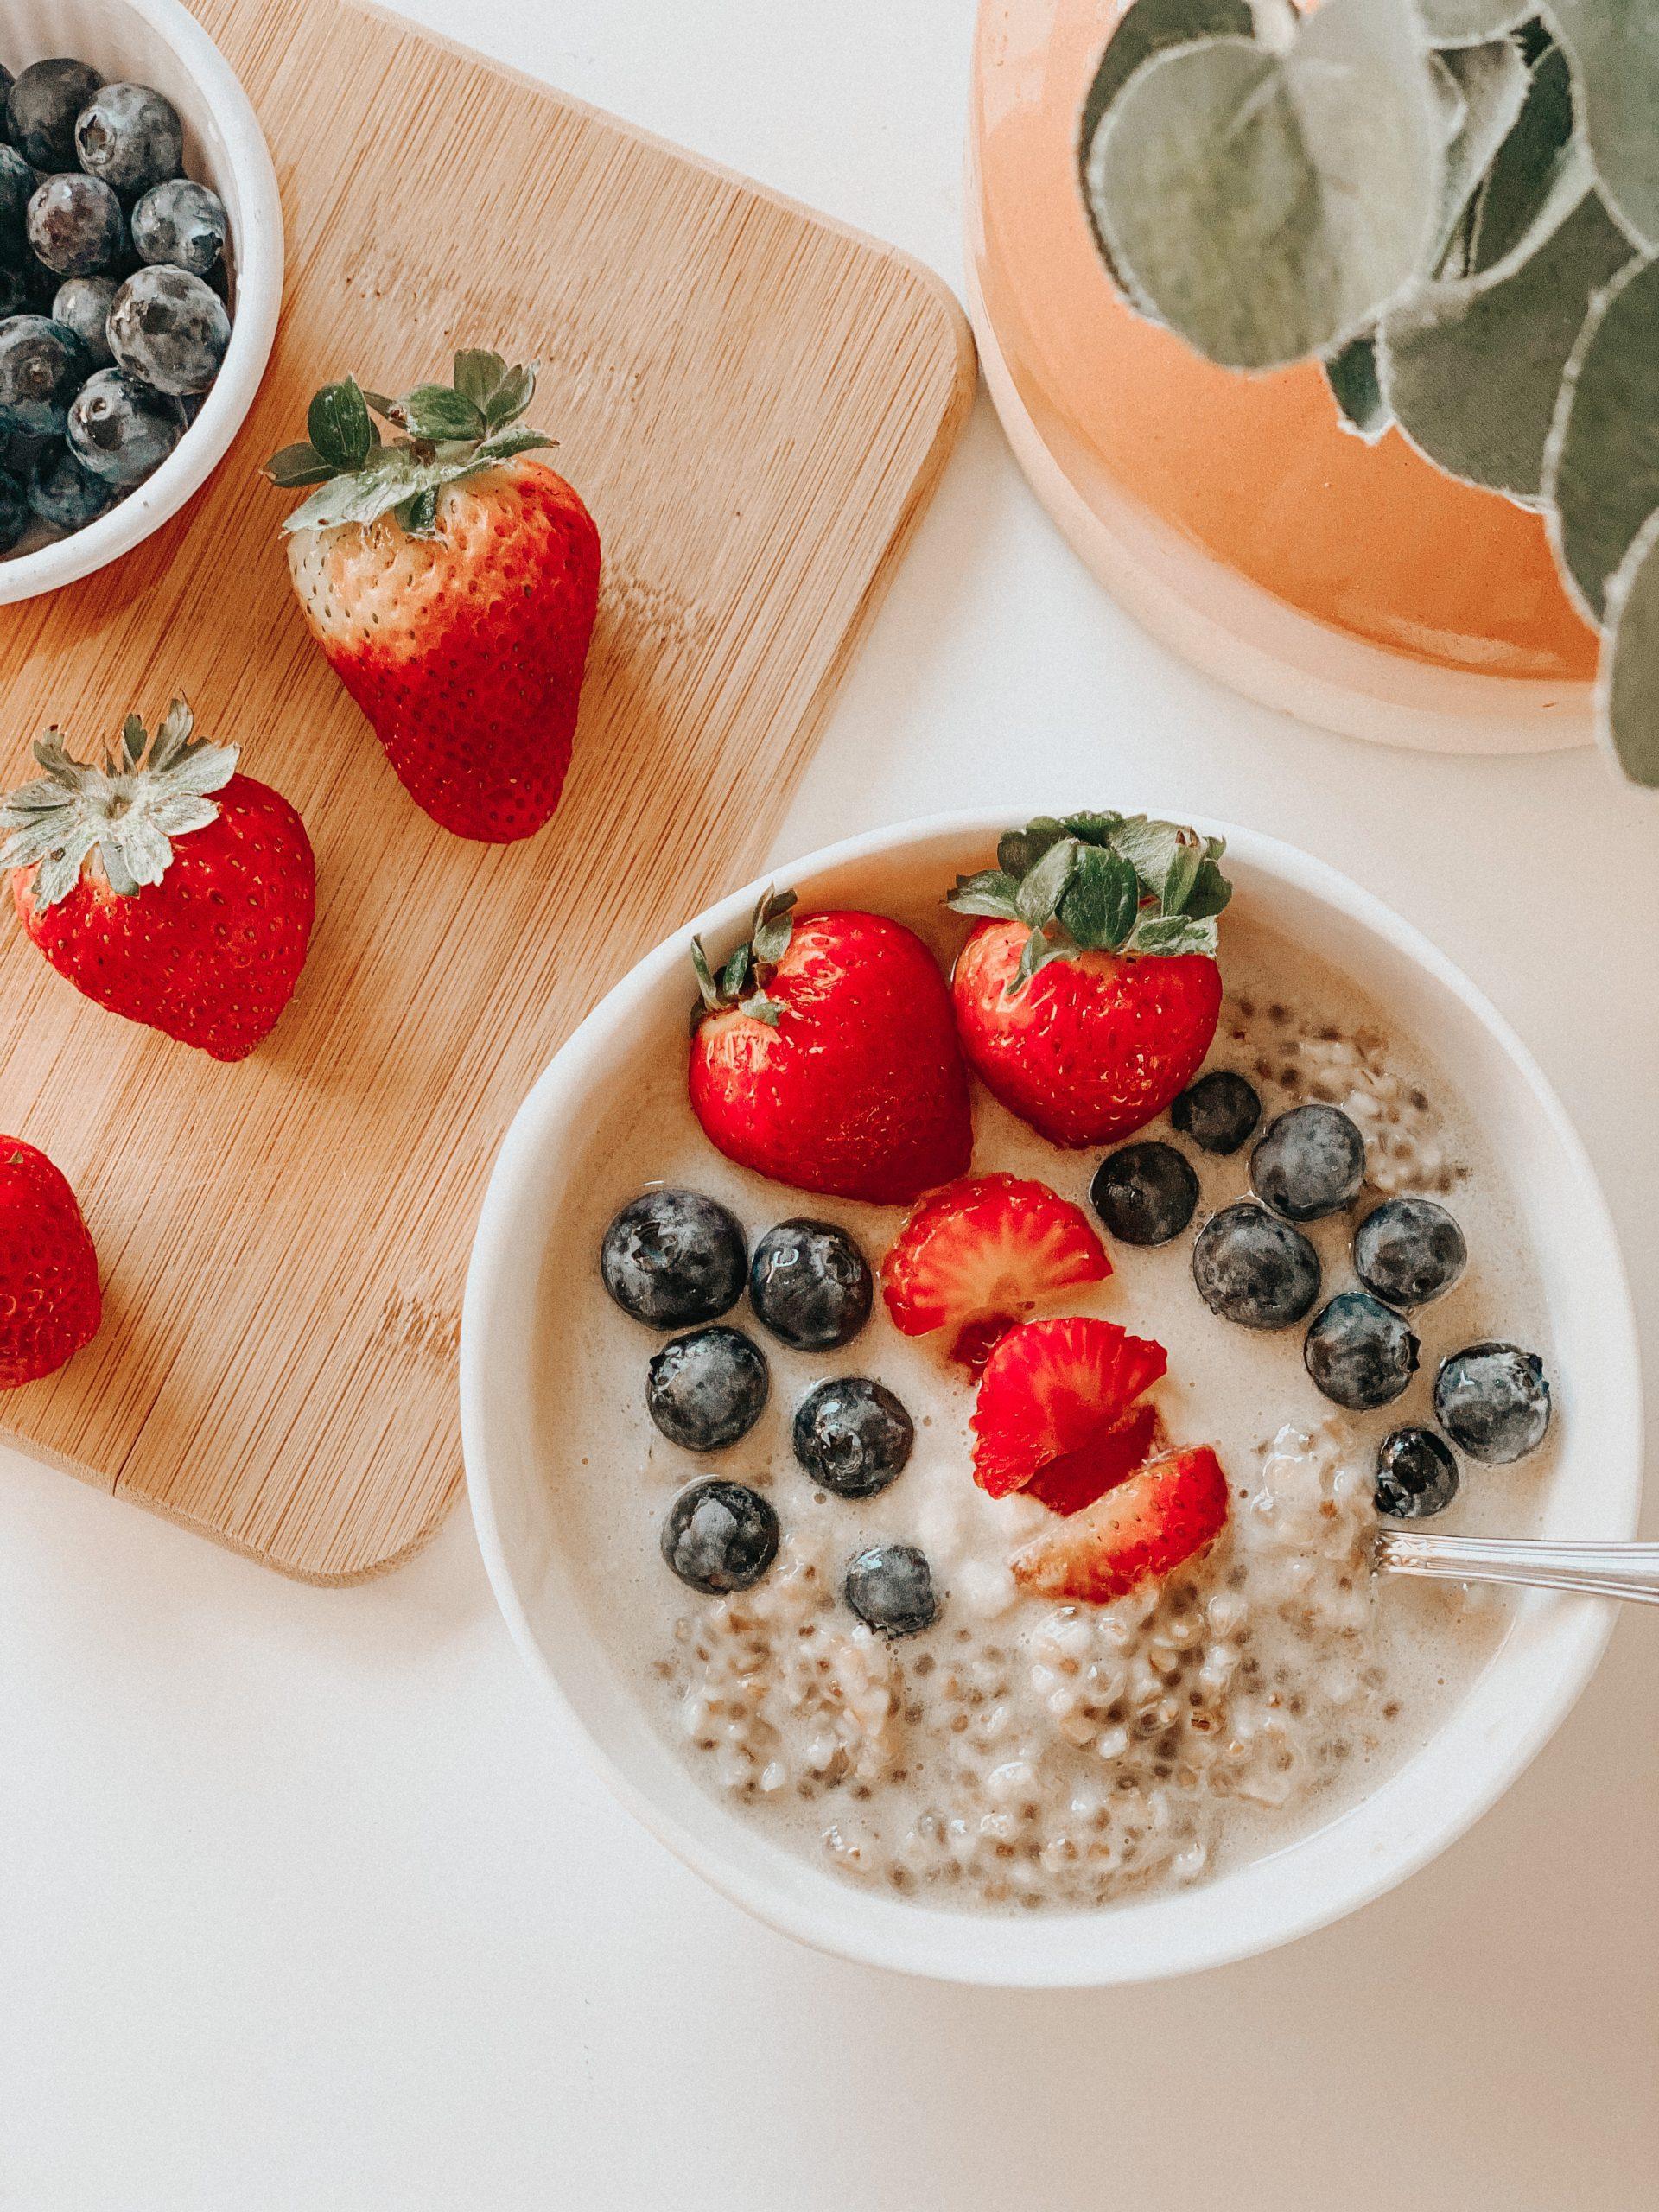 Berries and Cream Oatmeal | Dairy Free Vegan | Recovery Protein Lactation Oatmeal Breastfeeding Mama Recipes | Congee | Breastfeeding Tips | Lactation Cookie Alternative | tiffanieanne.com